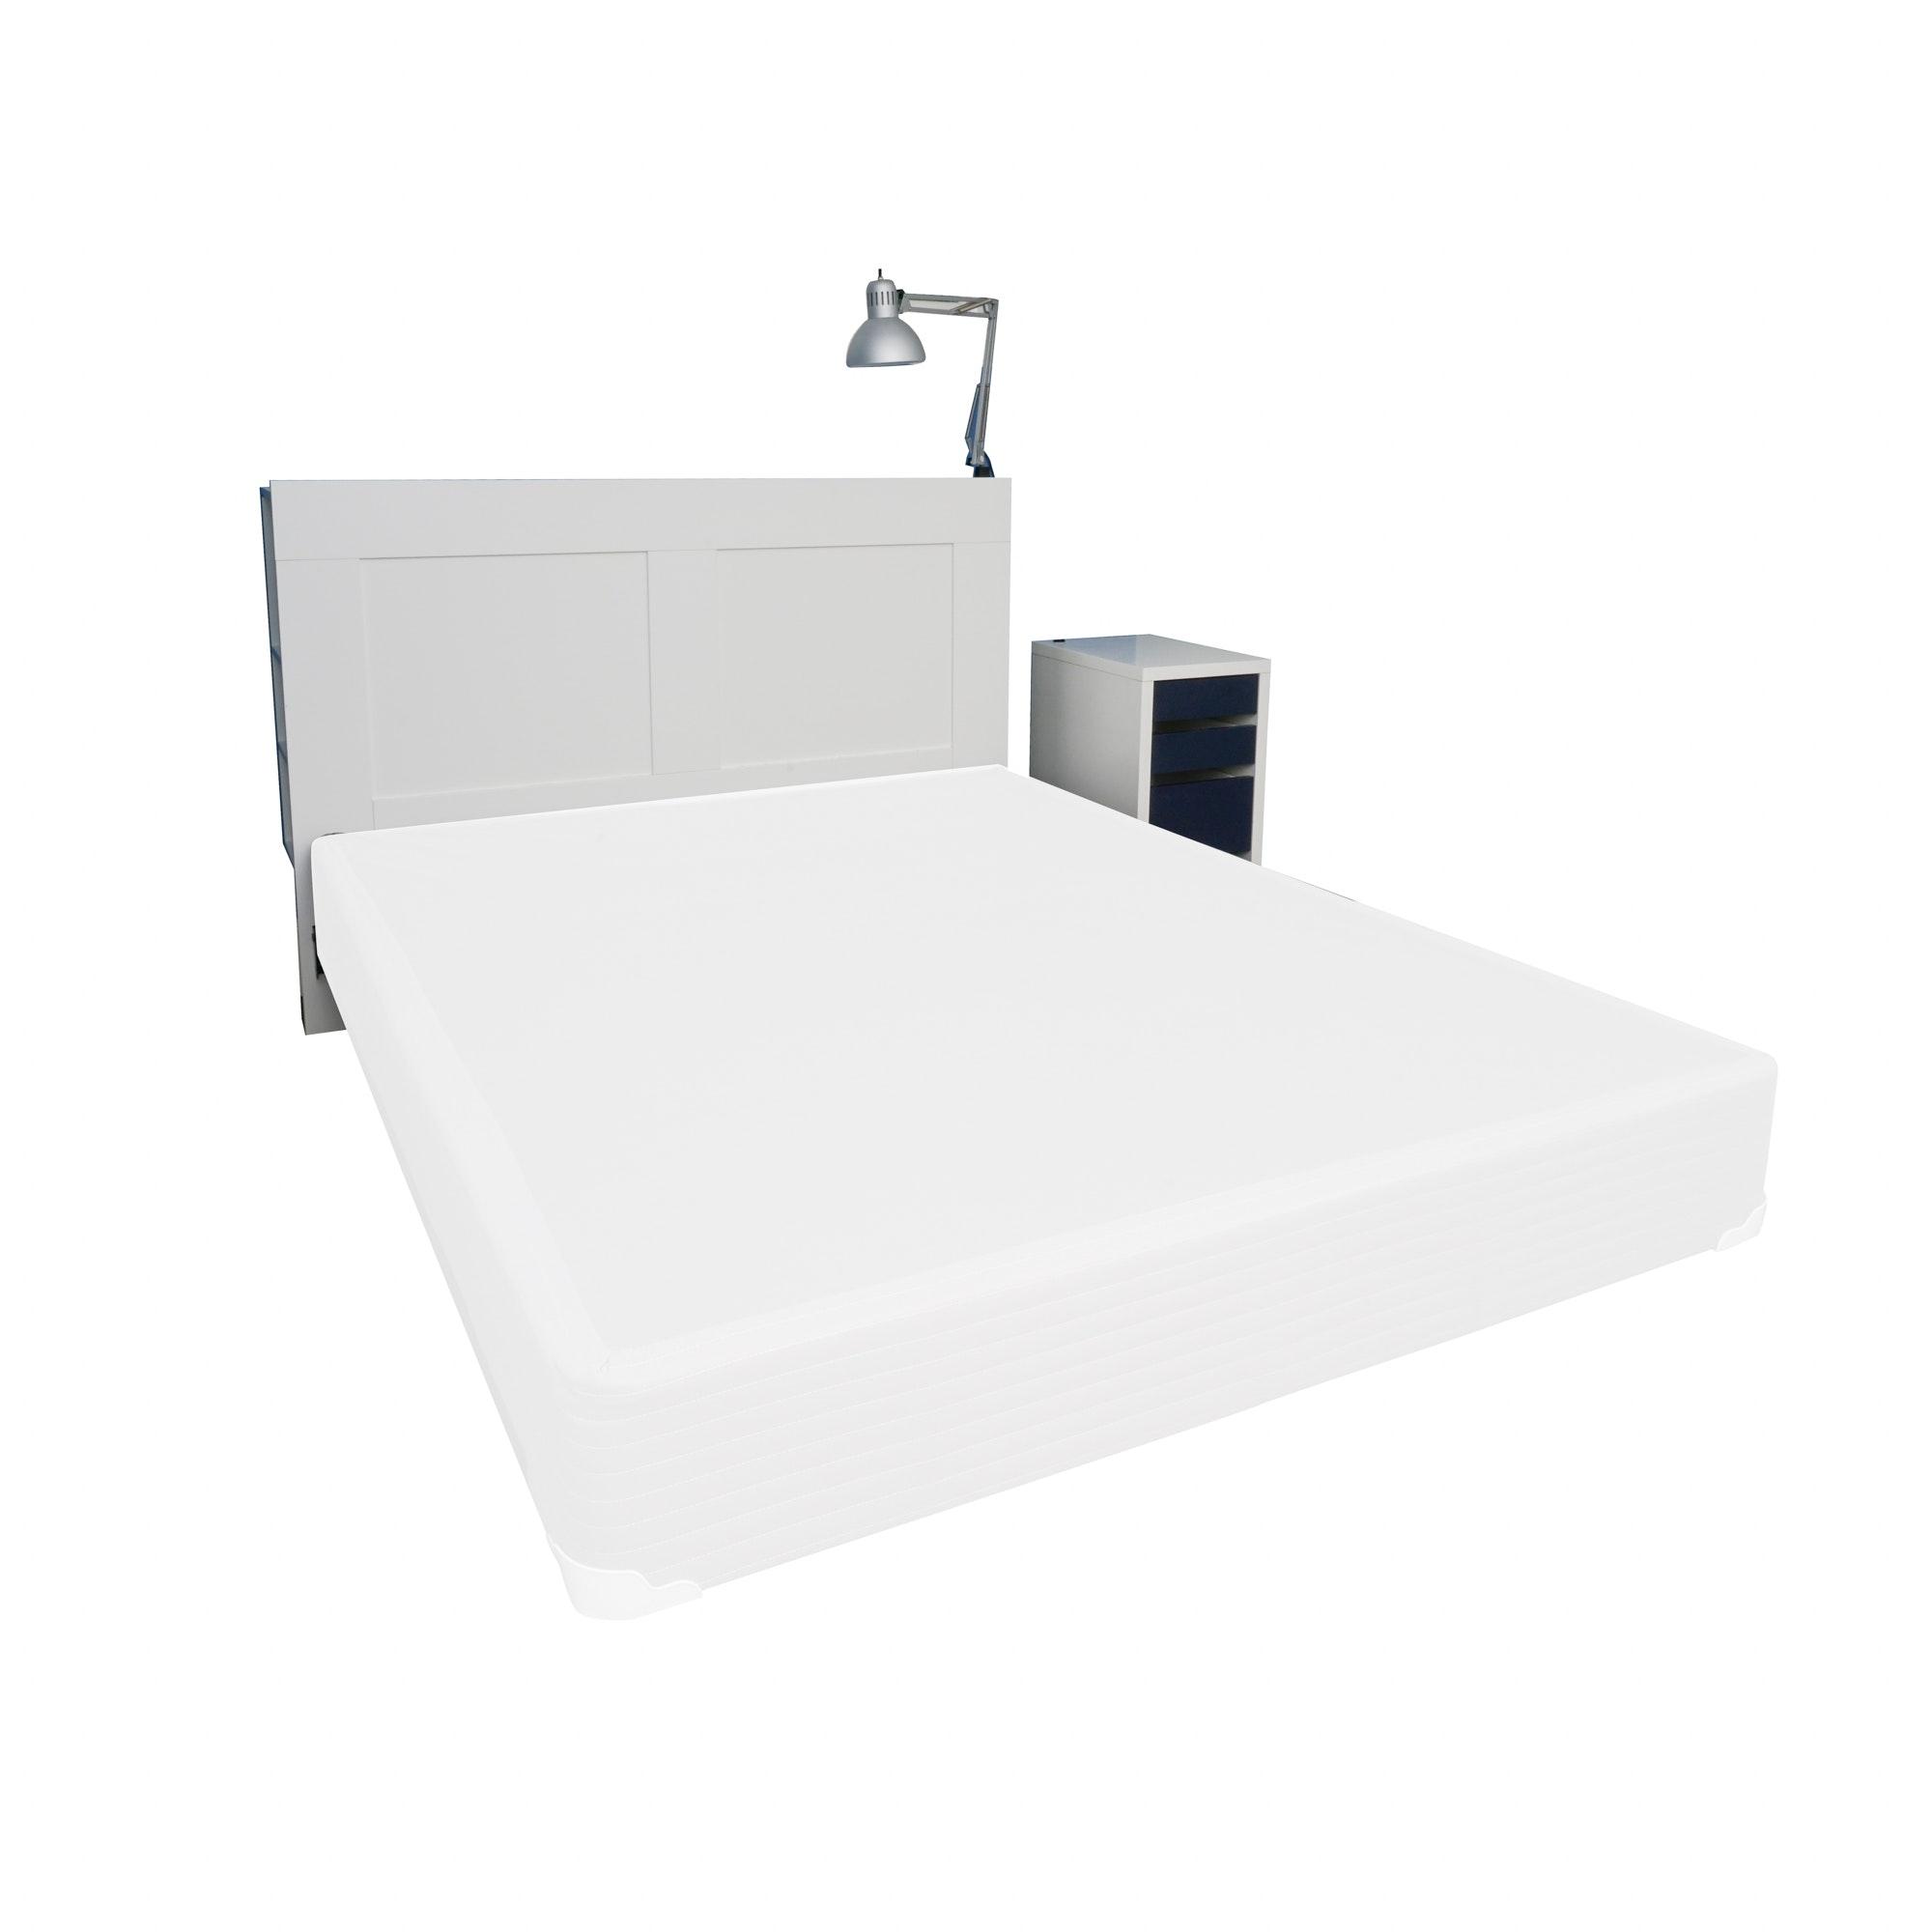 Queen Storage Headboard and Nightstand by IKEA